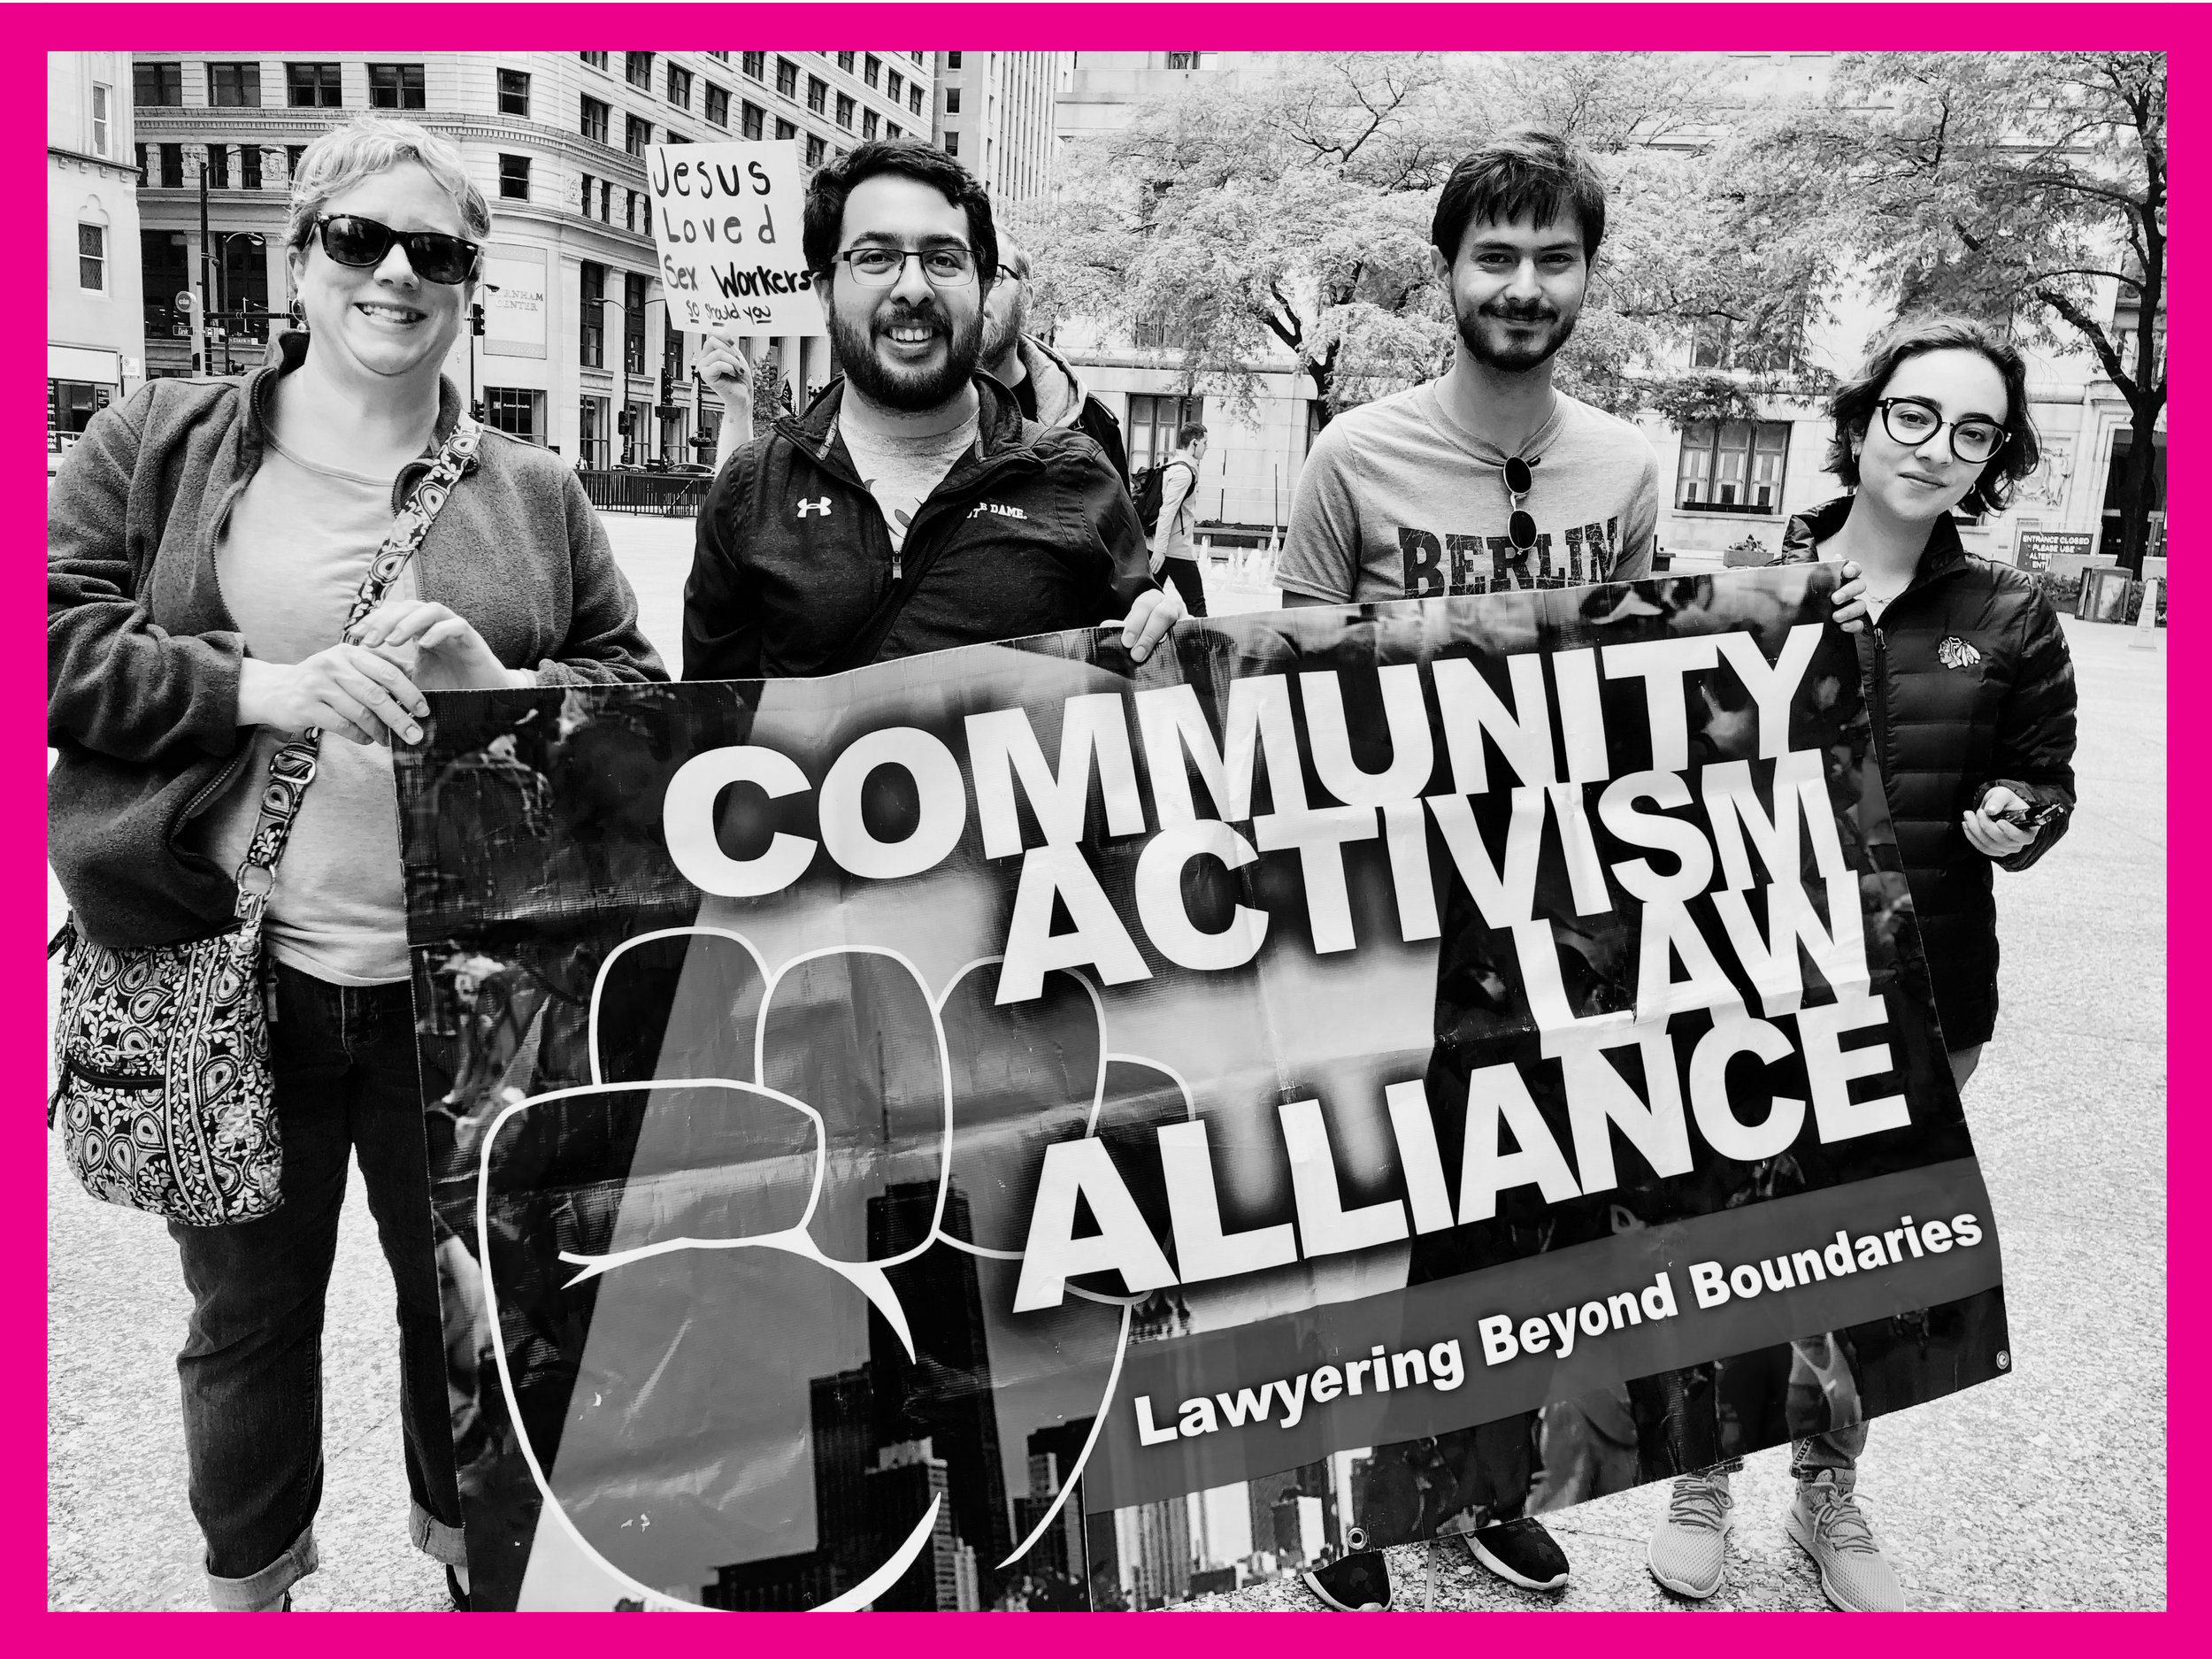 Community Activism and Empowerment